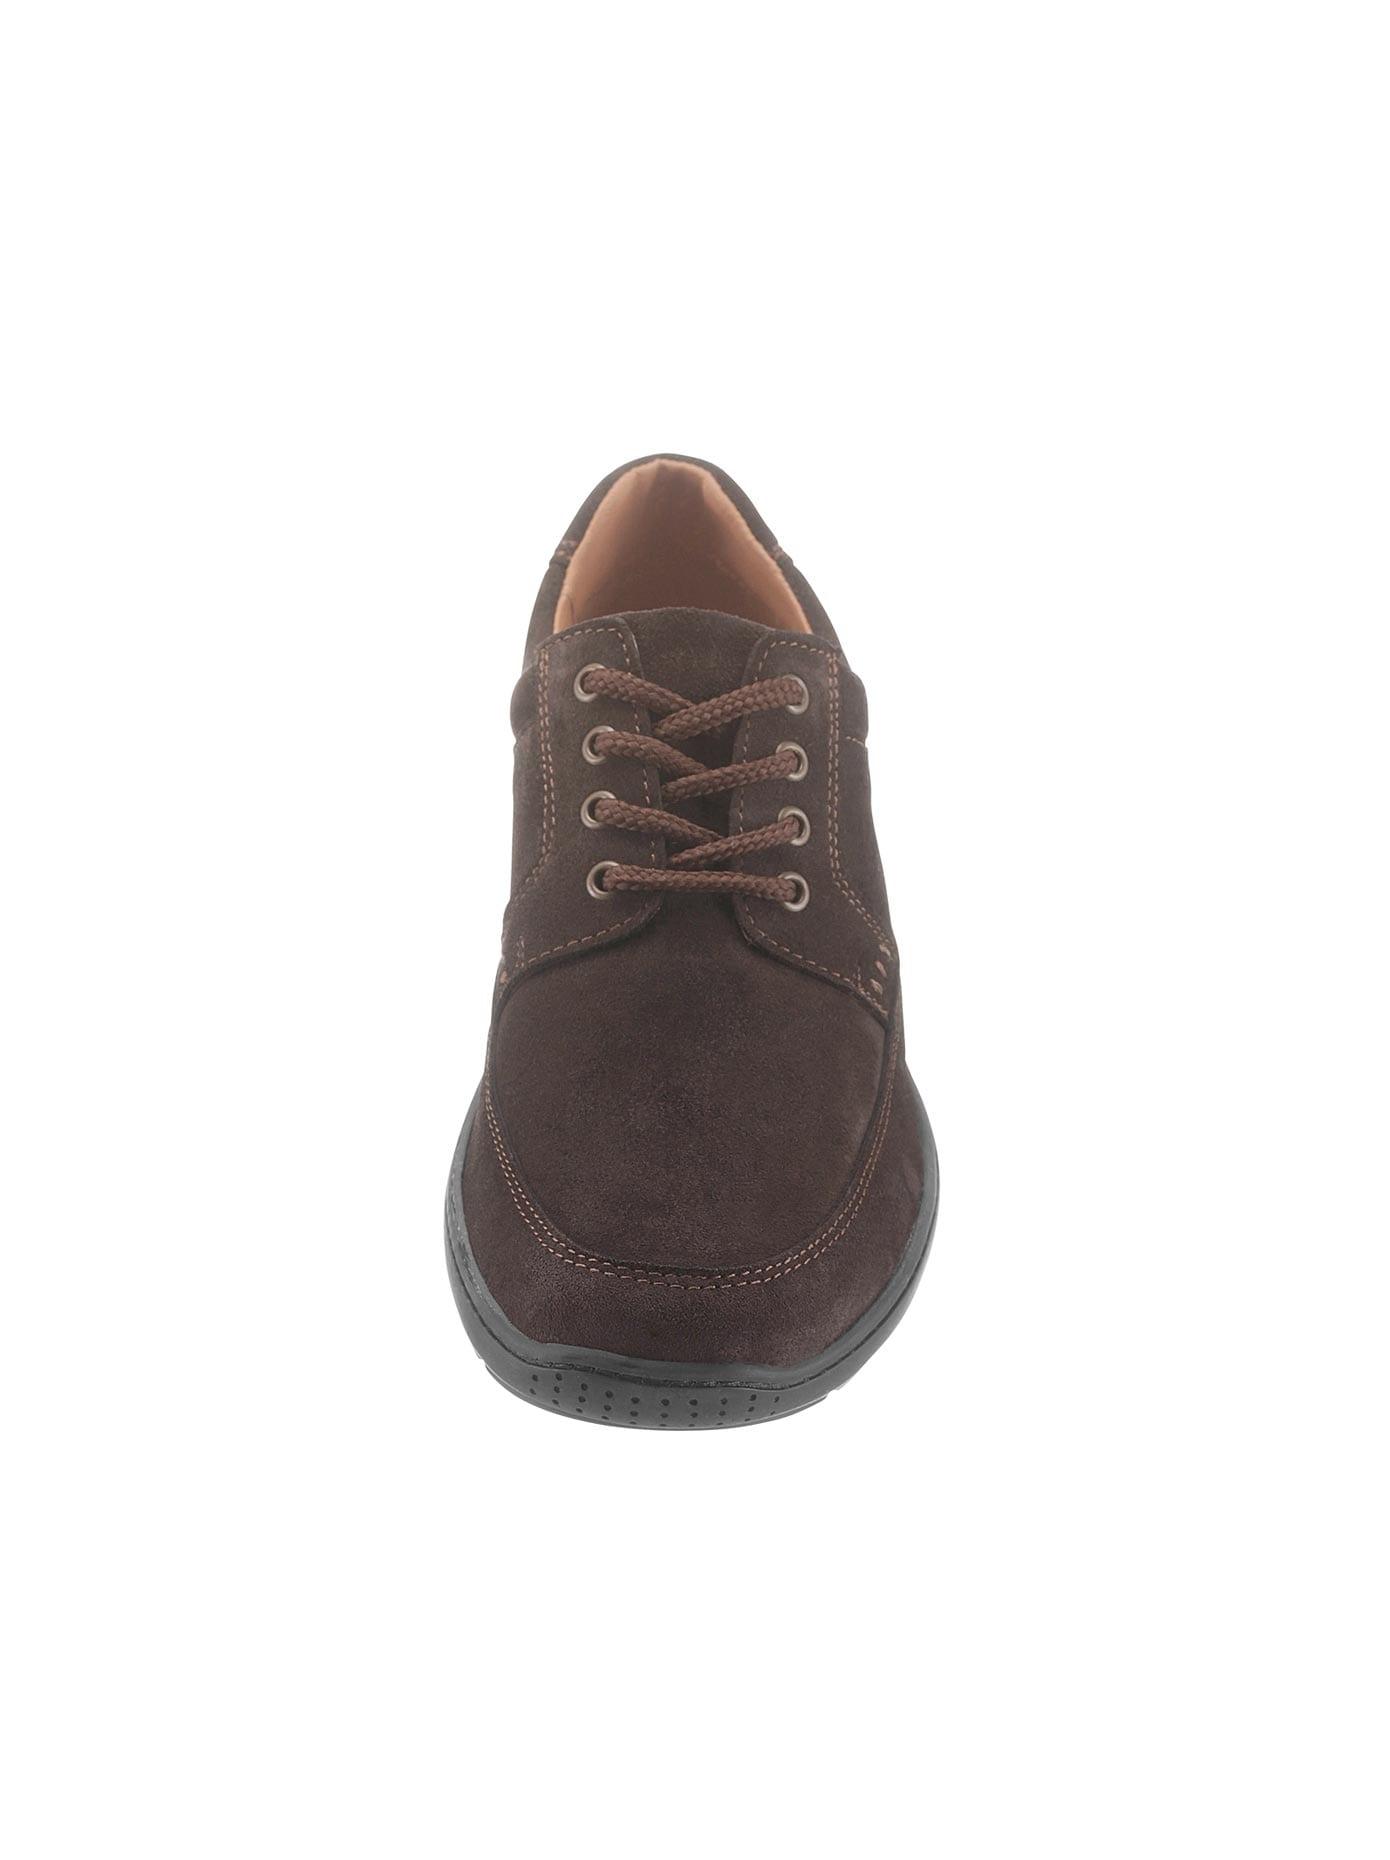 Corkies Schnürschuh | Schuhe > Schnürschuhe | Braun | Corkies